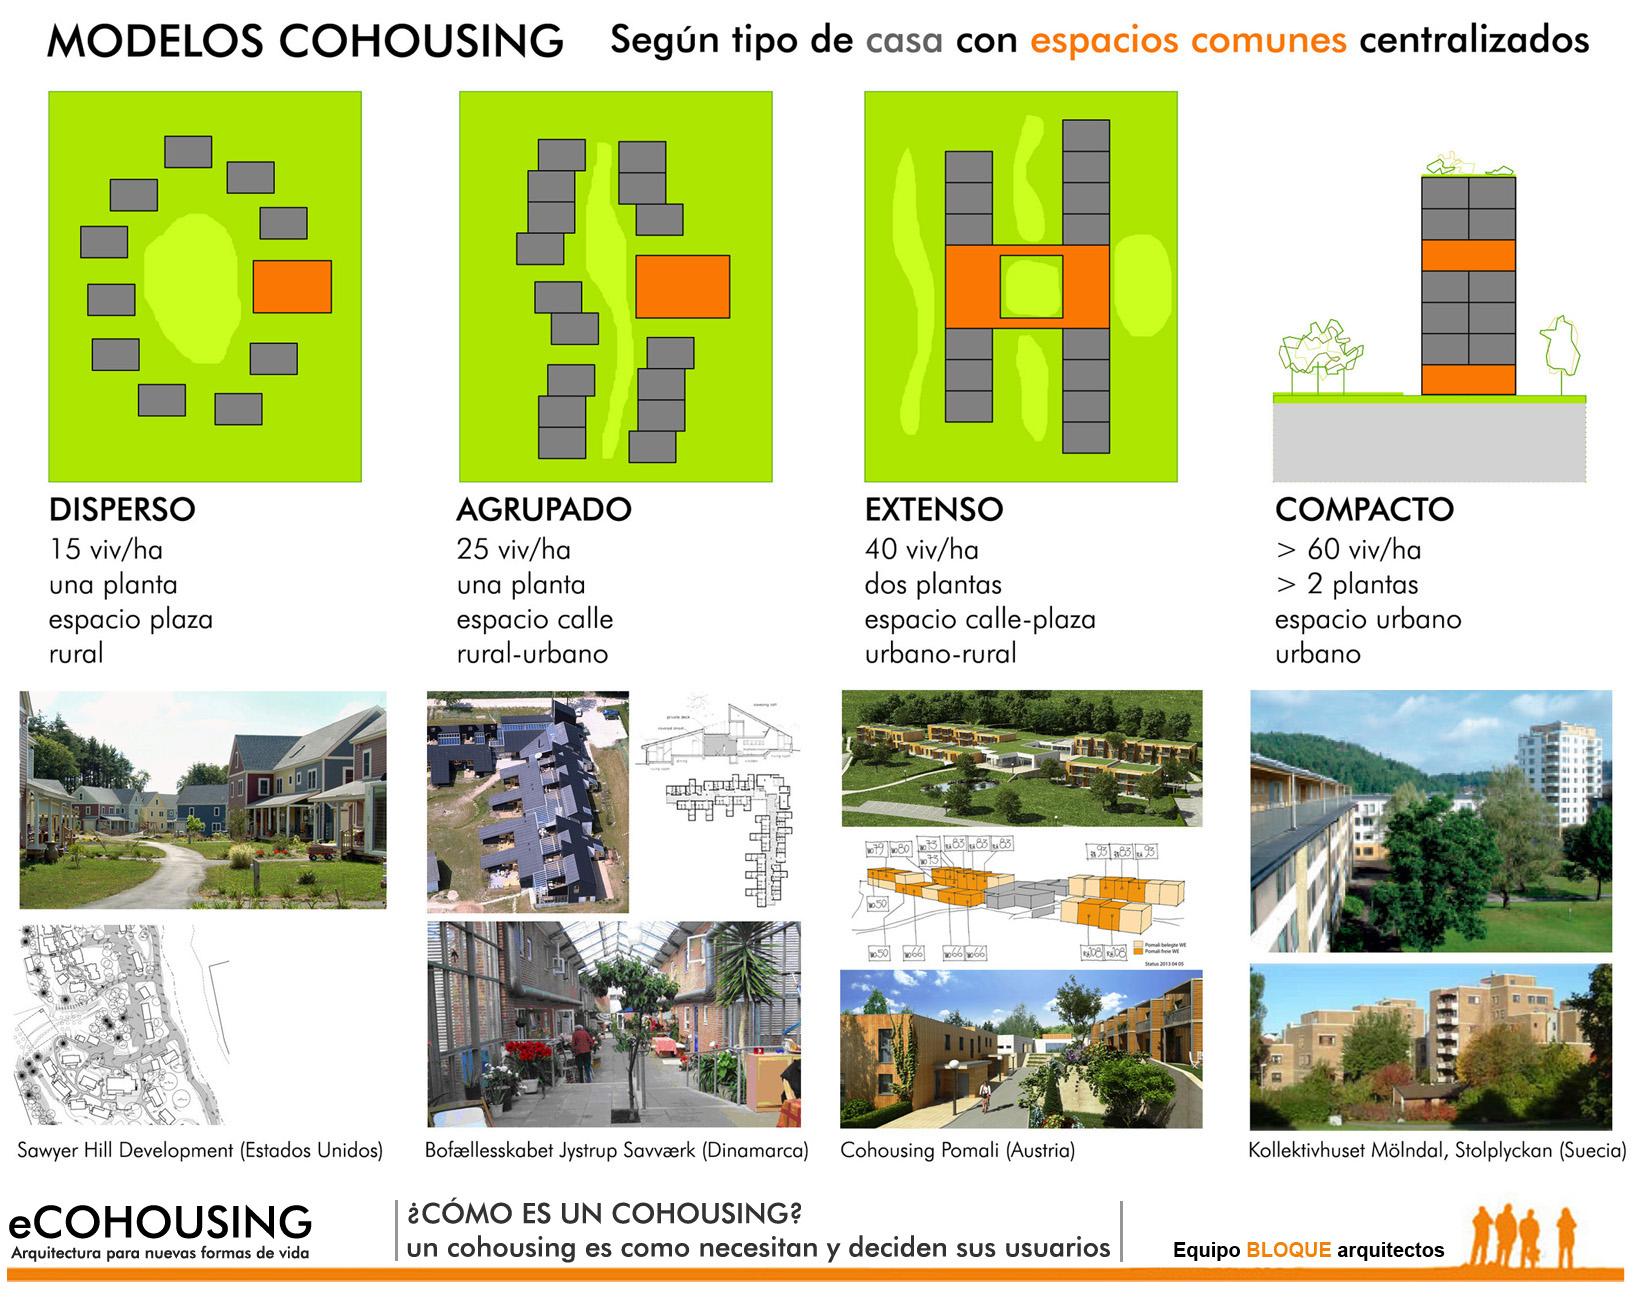 eCOHOUSING_MODELOS COHOUSING_TIPOS 01